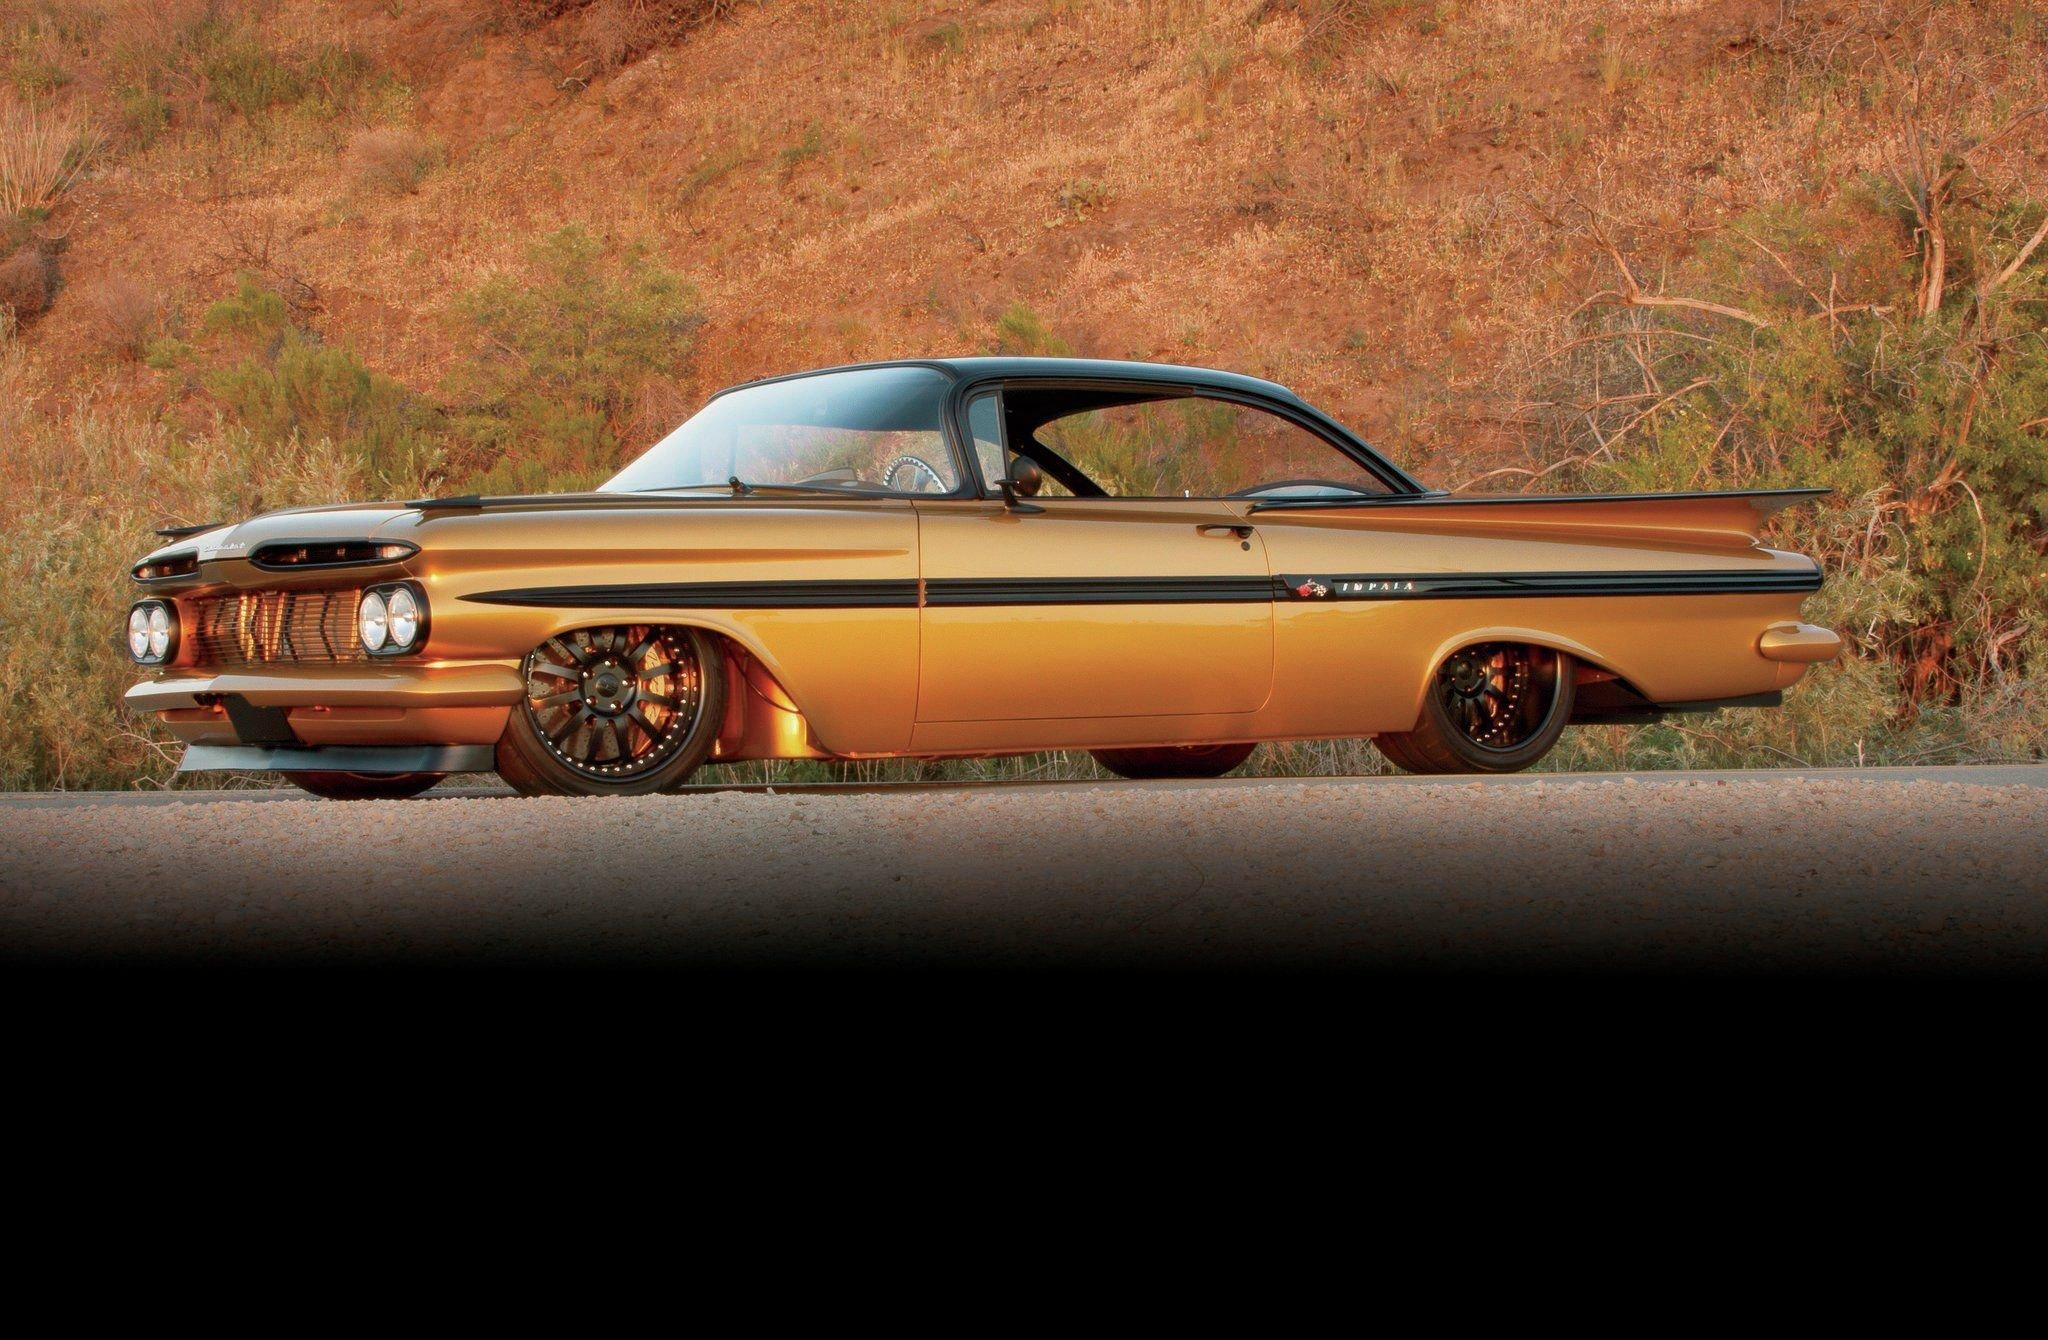 1959 Chevrolet Impala Hardtop-03 wallpaper